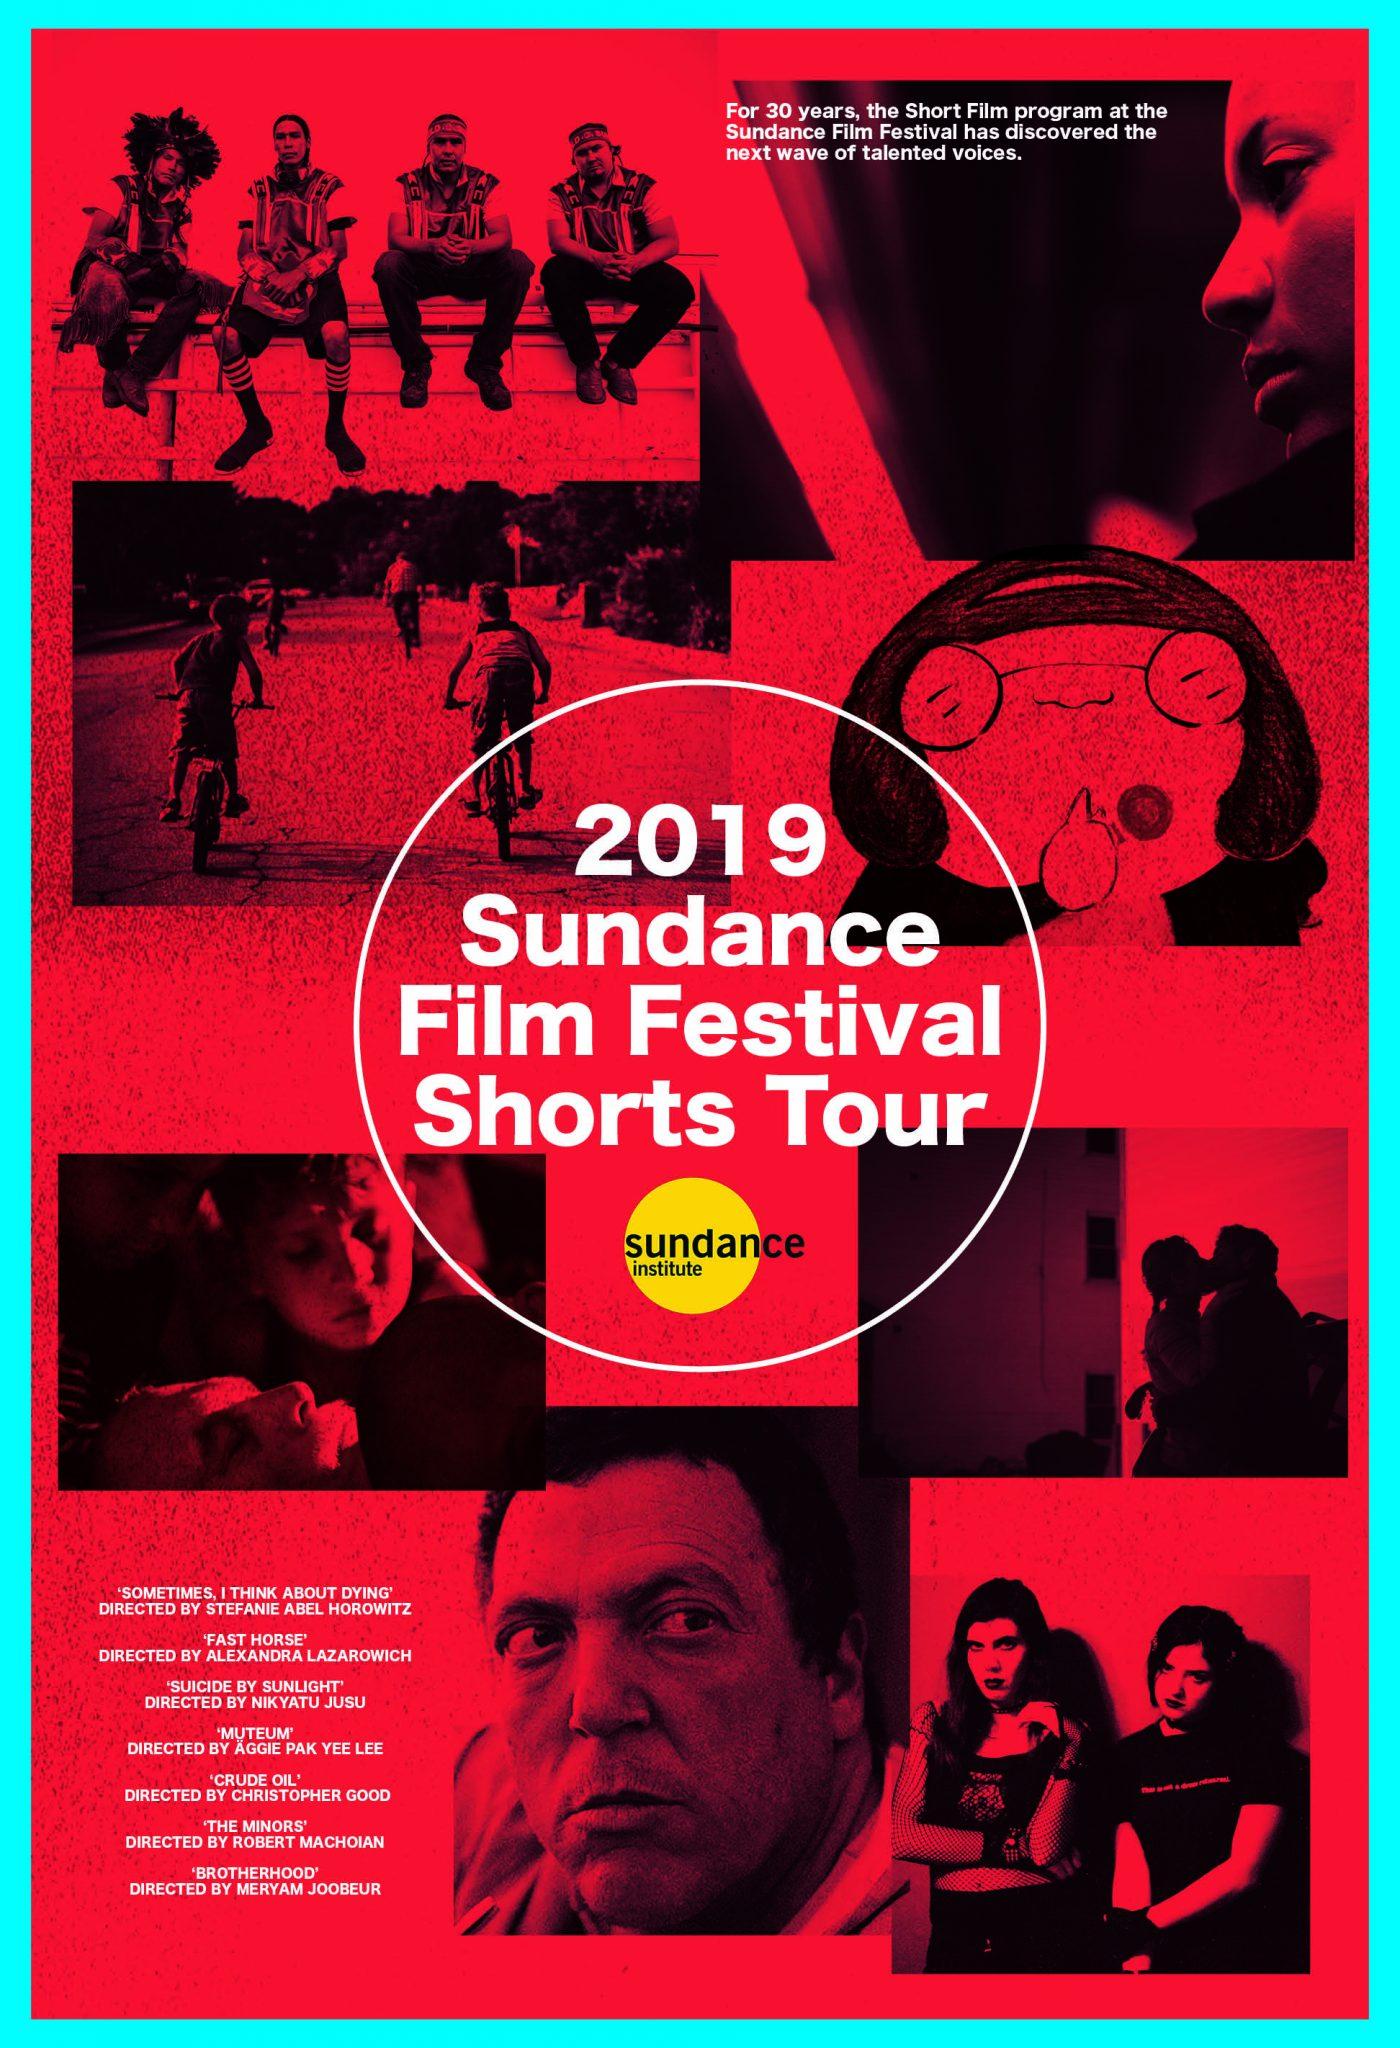 2019 Sundance Film Festival Shorts